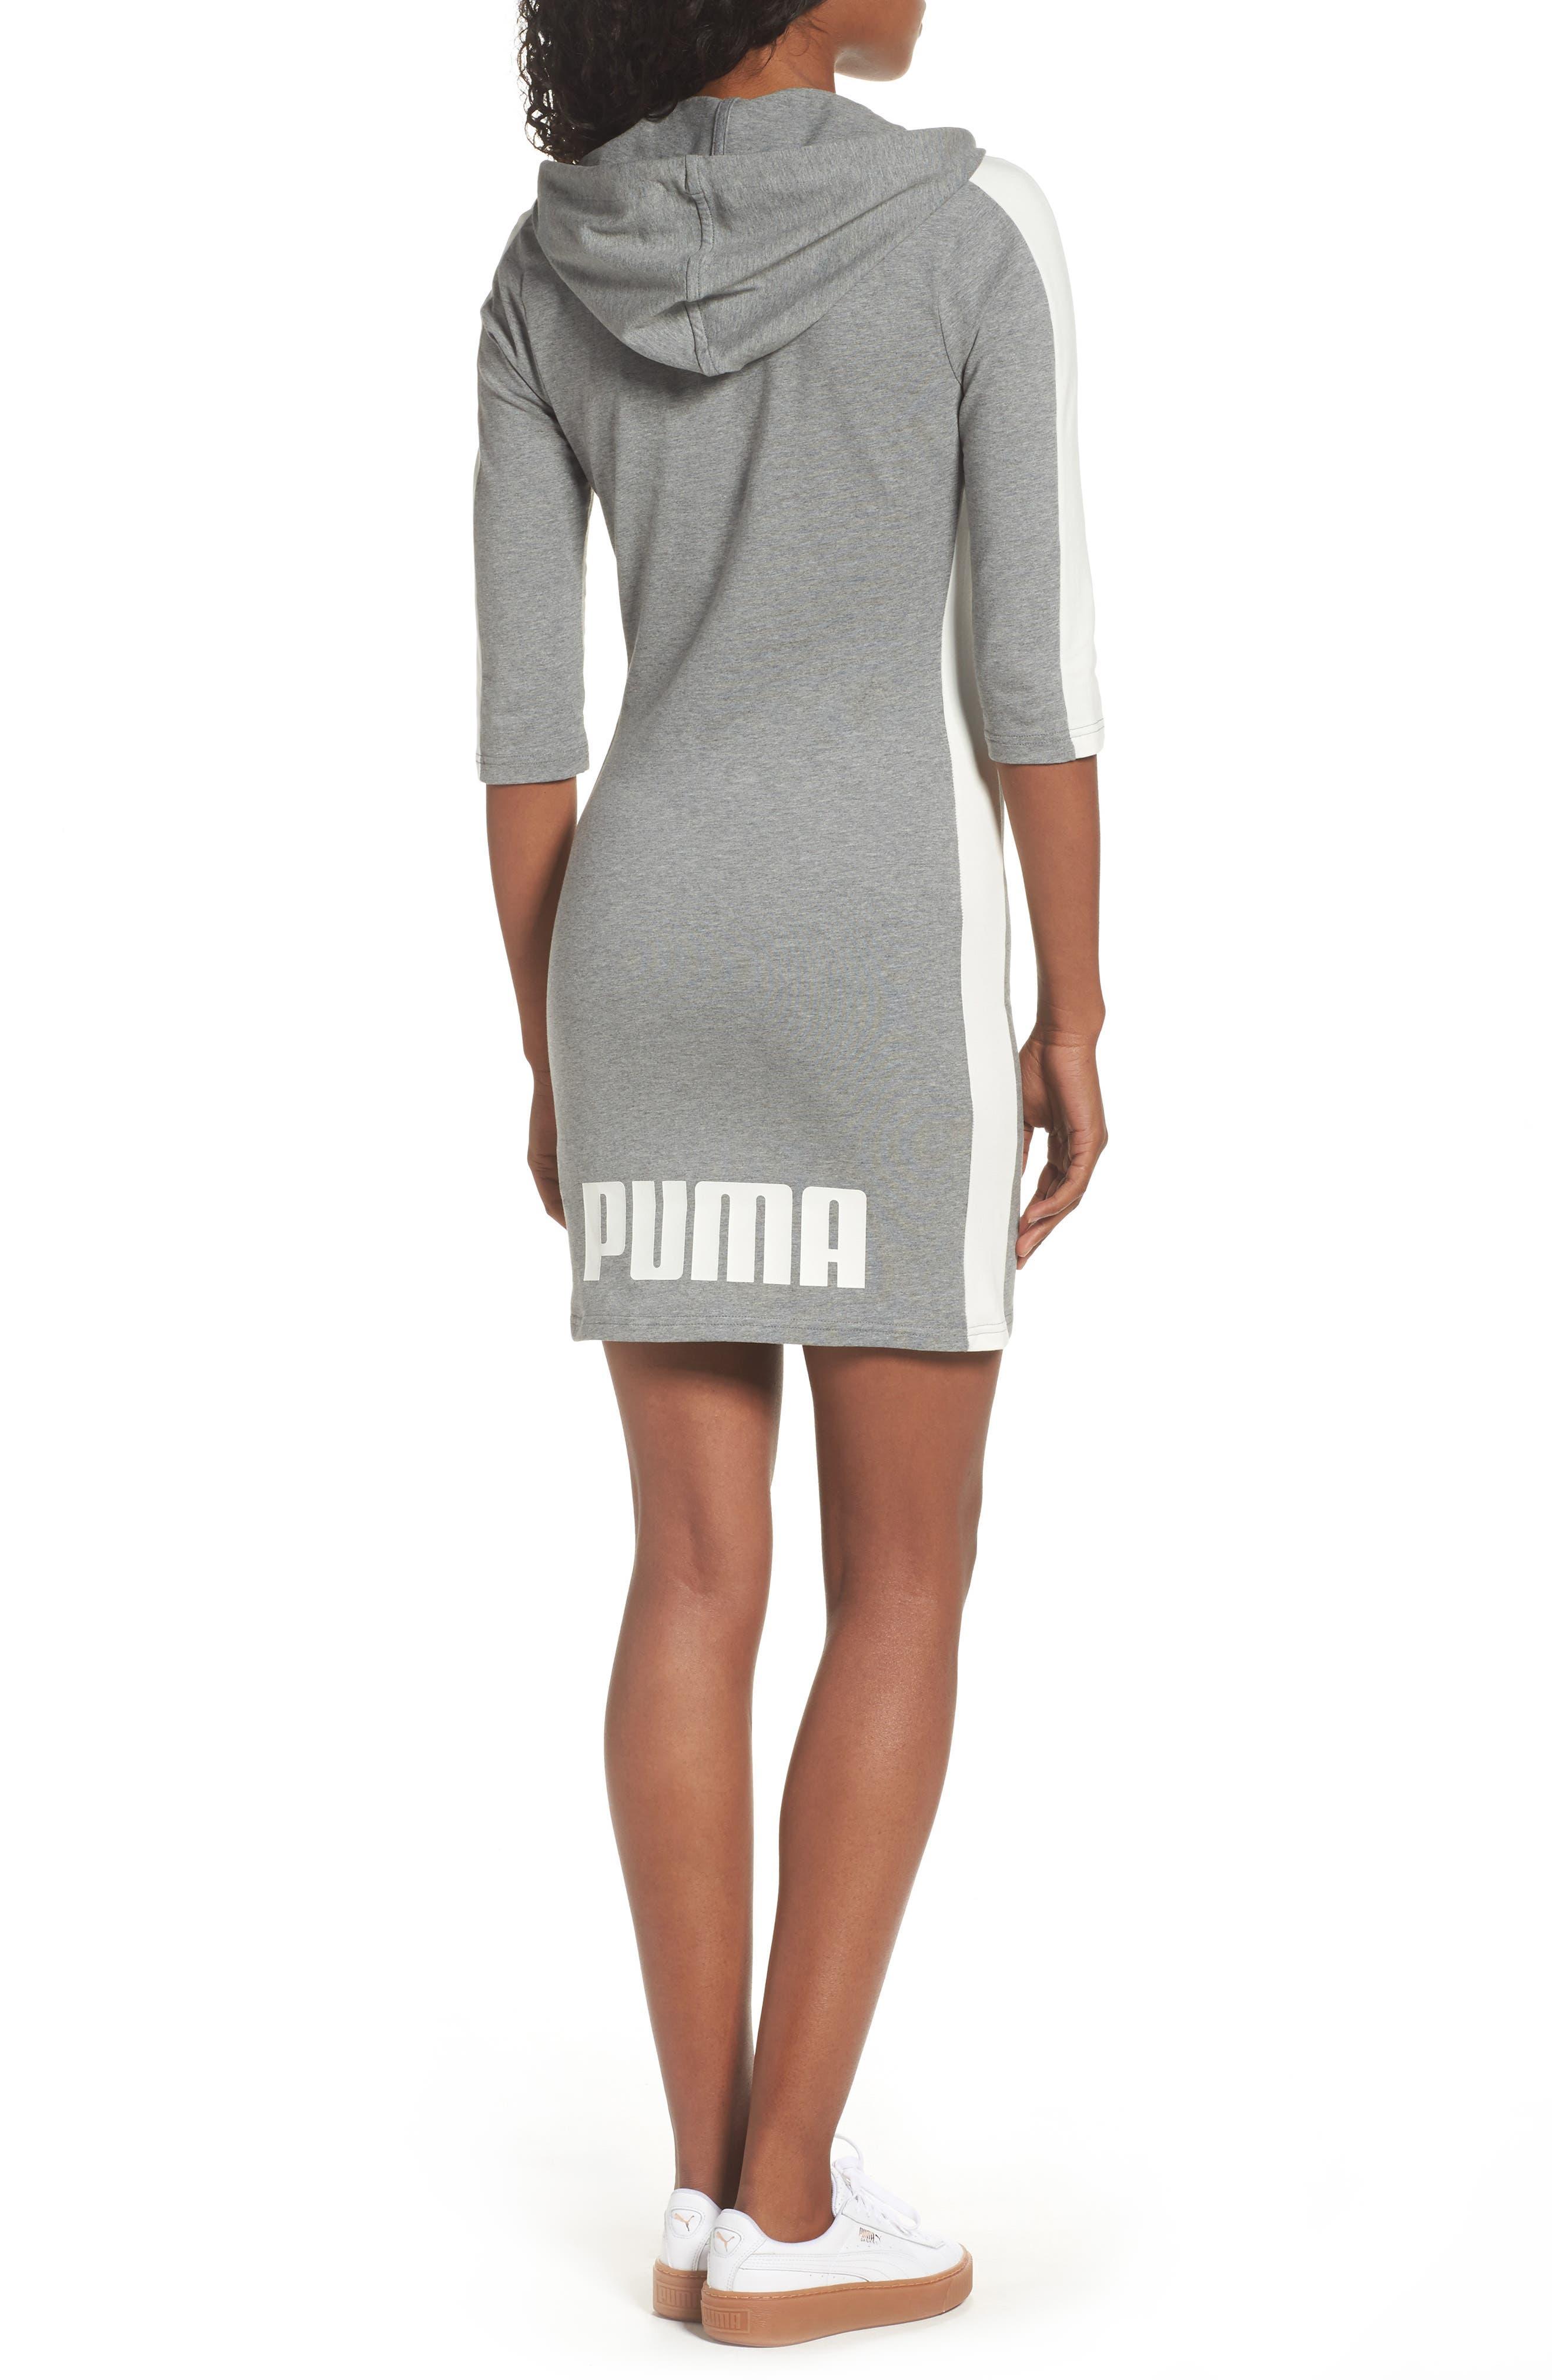 T7 Sweatshirt Dress,                             Alternate thumbnail 8, color,